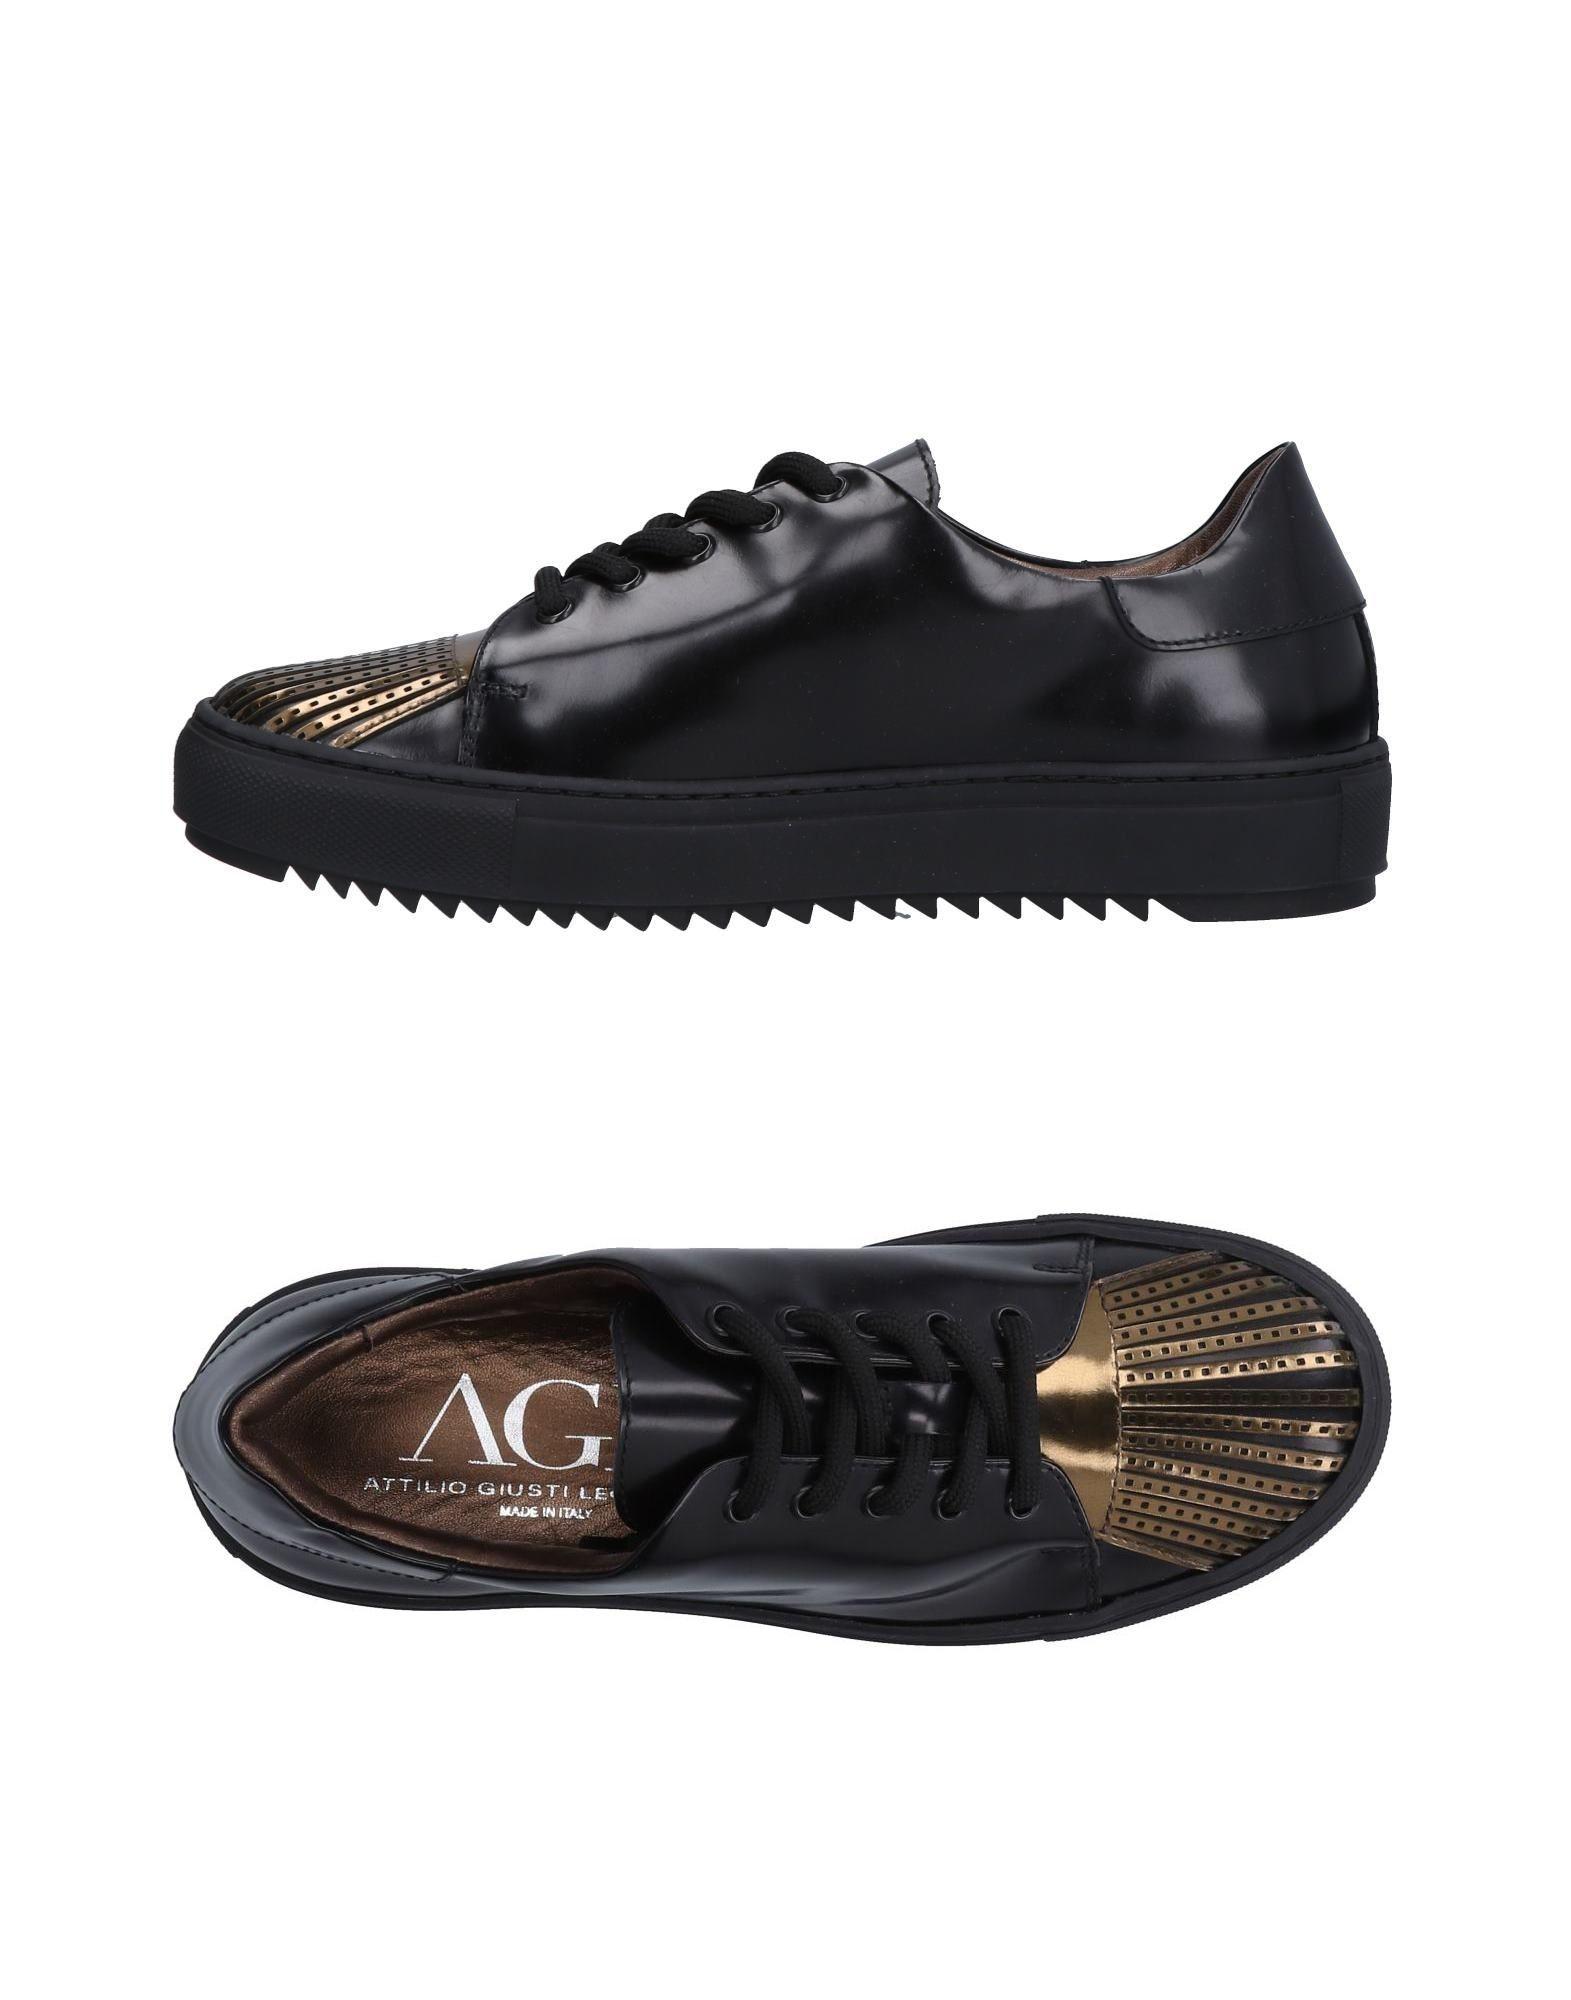 1667847a8e4b Agl Agl Agl Attilio Giusti Leombruni Sneakers - Women Agl Attilio Giusti  Leombruni Sneakers online on Canada - 11502735XD 1c08d1